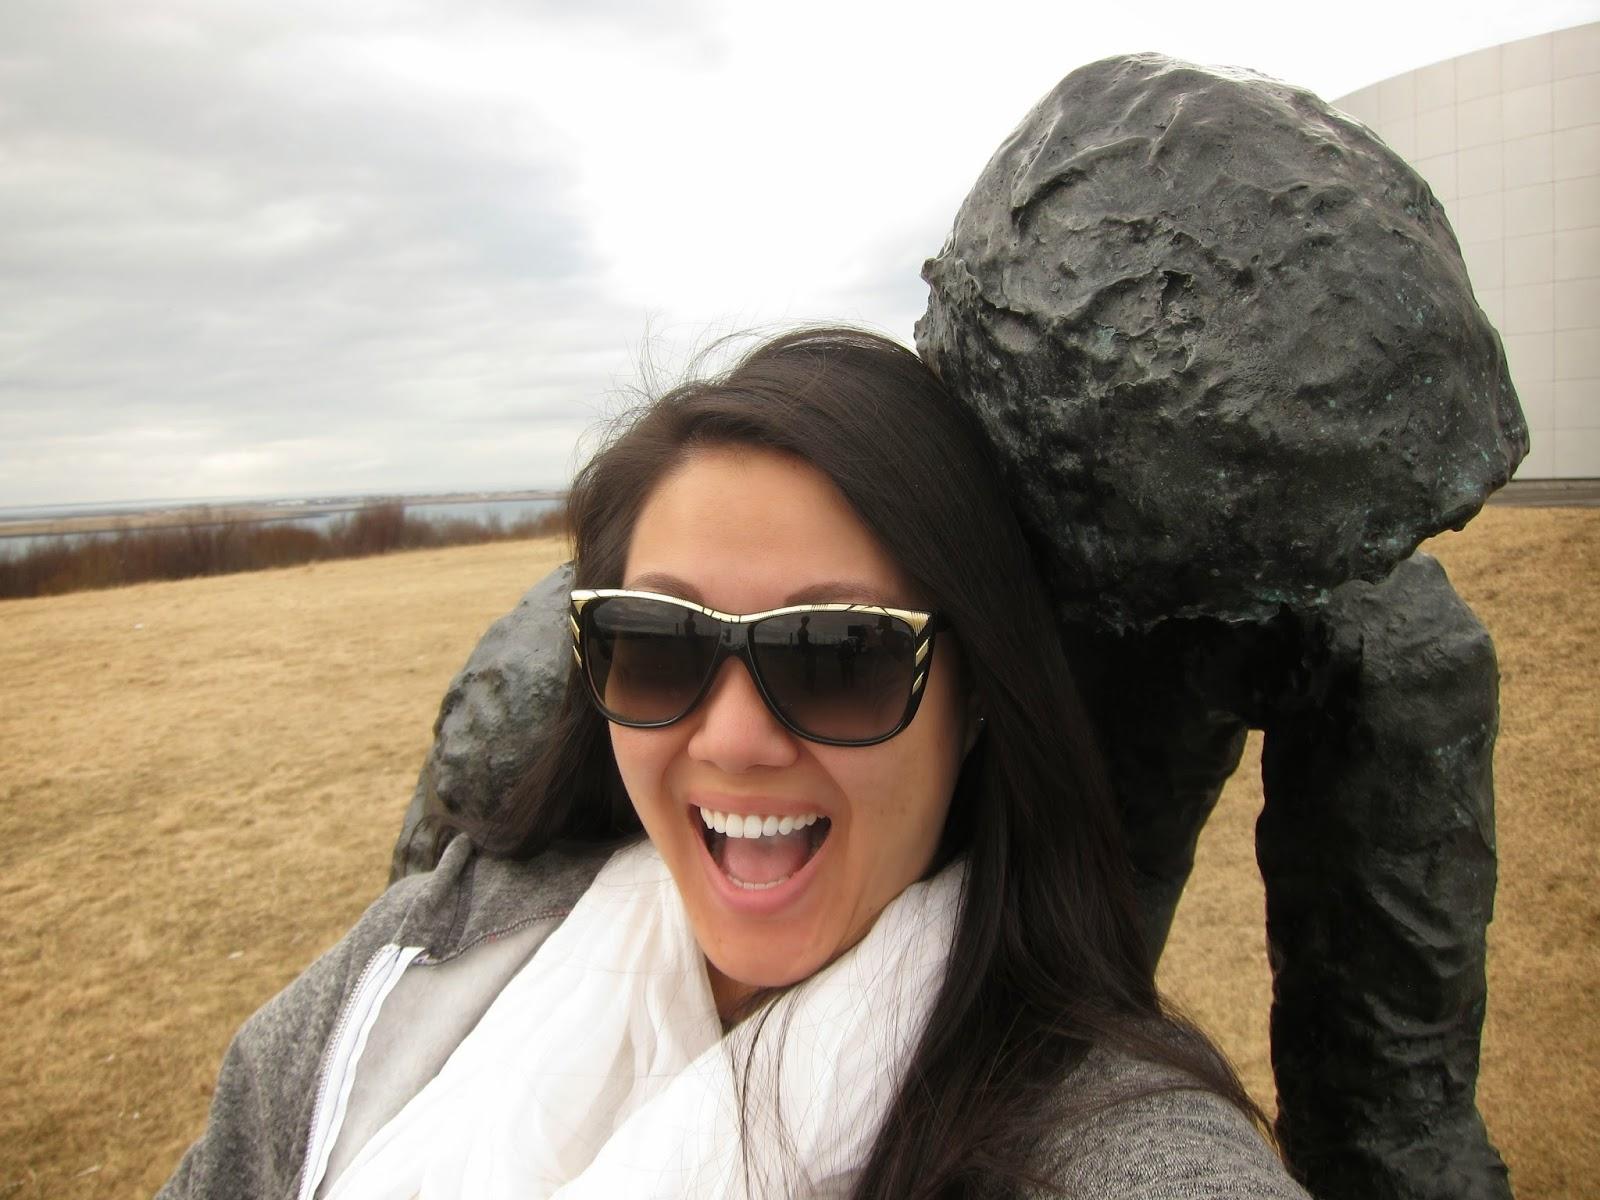 Statue selfie time